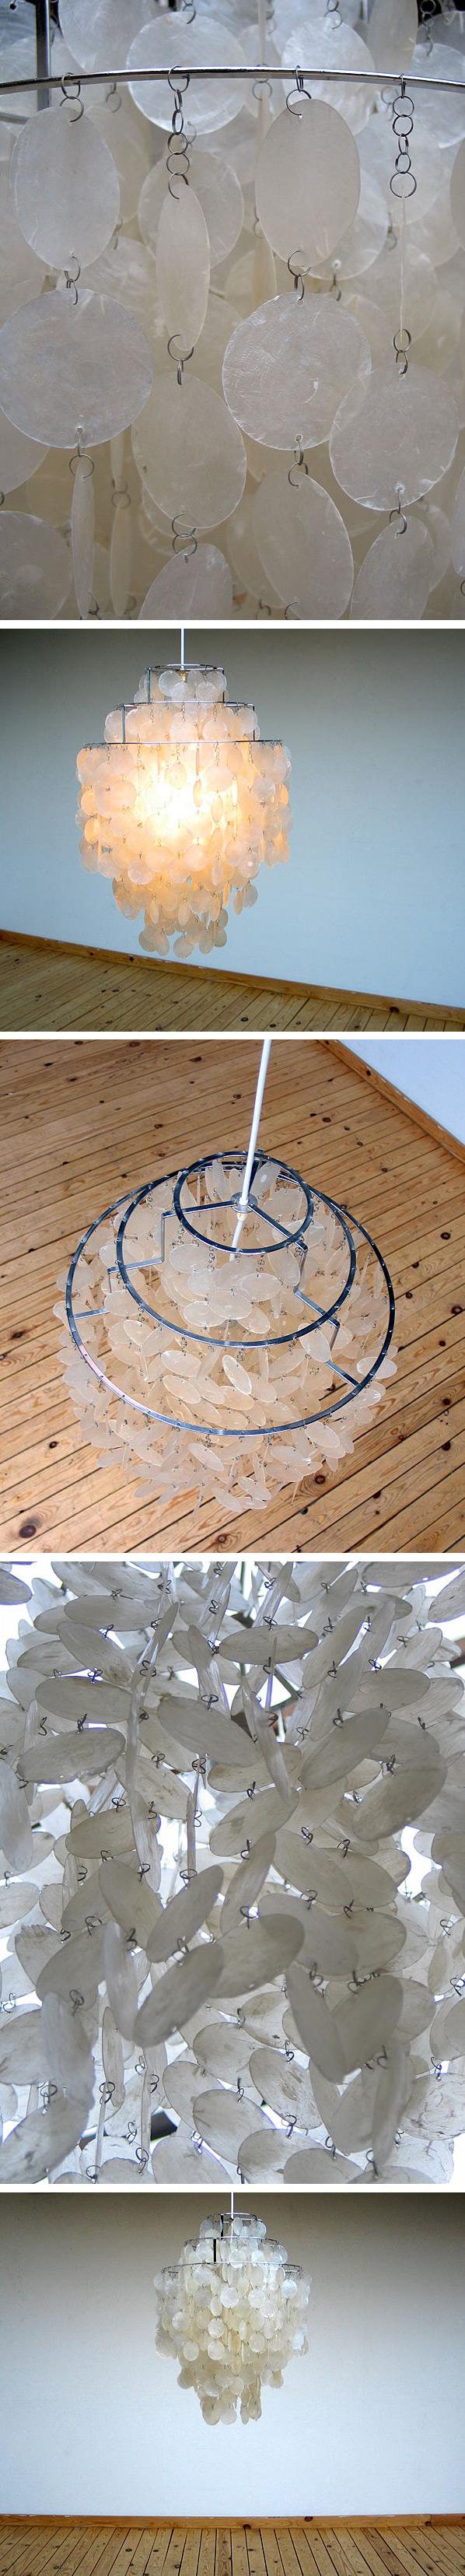 Verner Panton chandelier Fun 1 DM J Luber AG Large